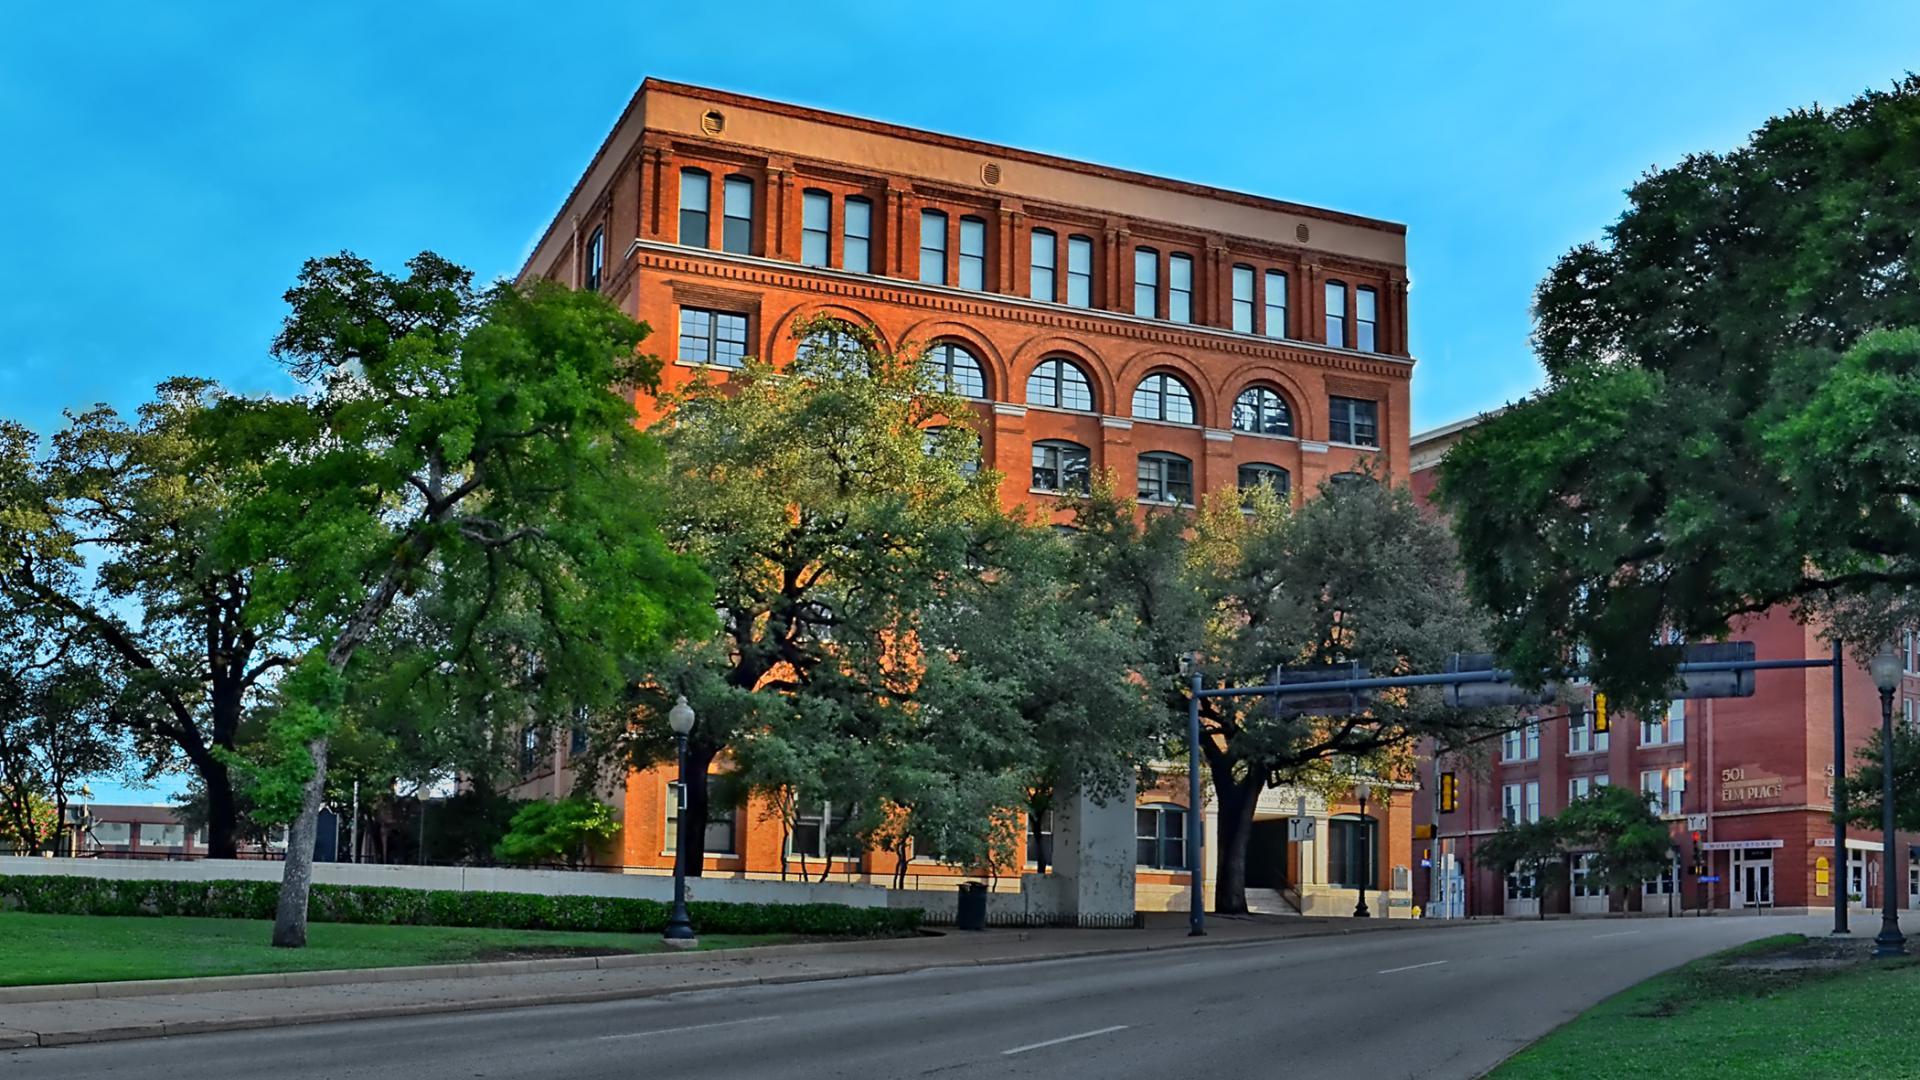 The Sixth Floor Museum in Dallas